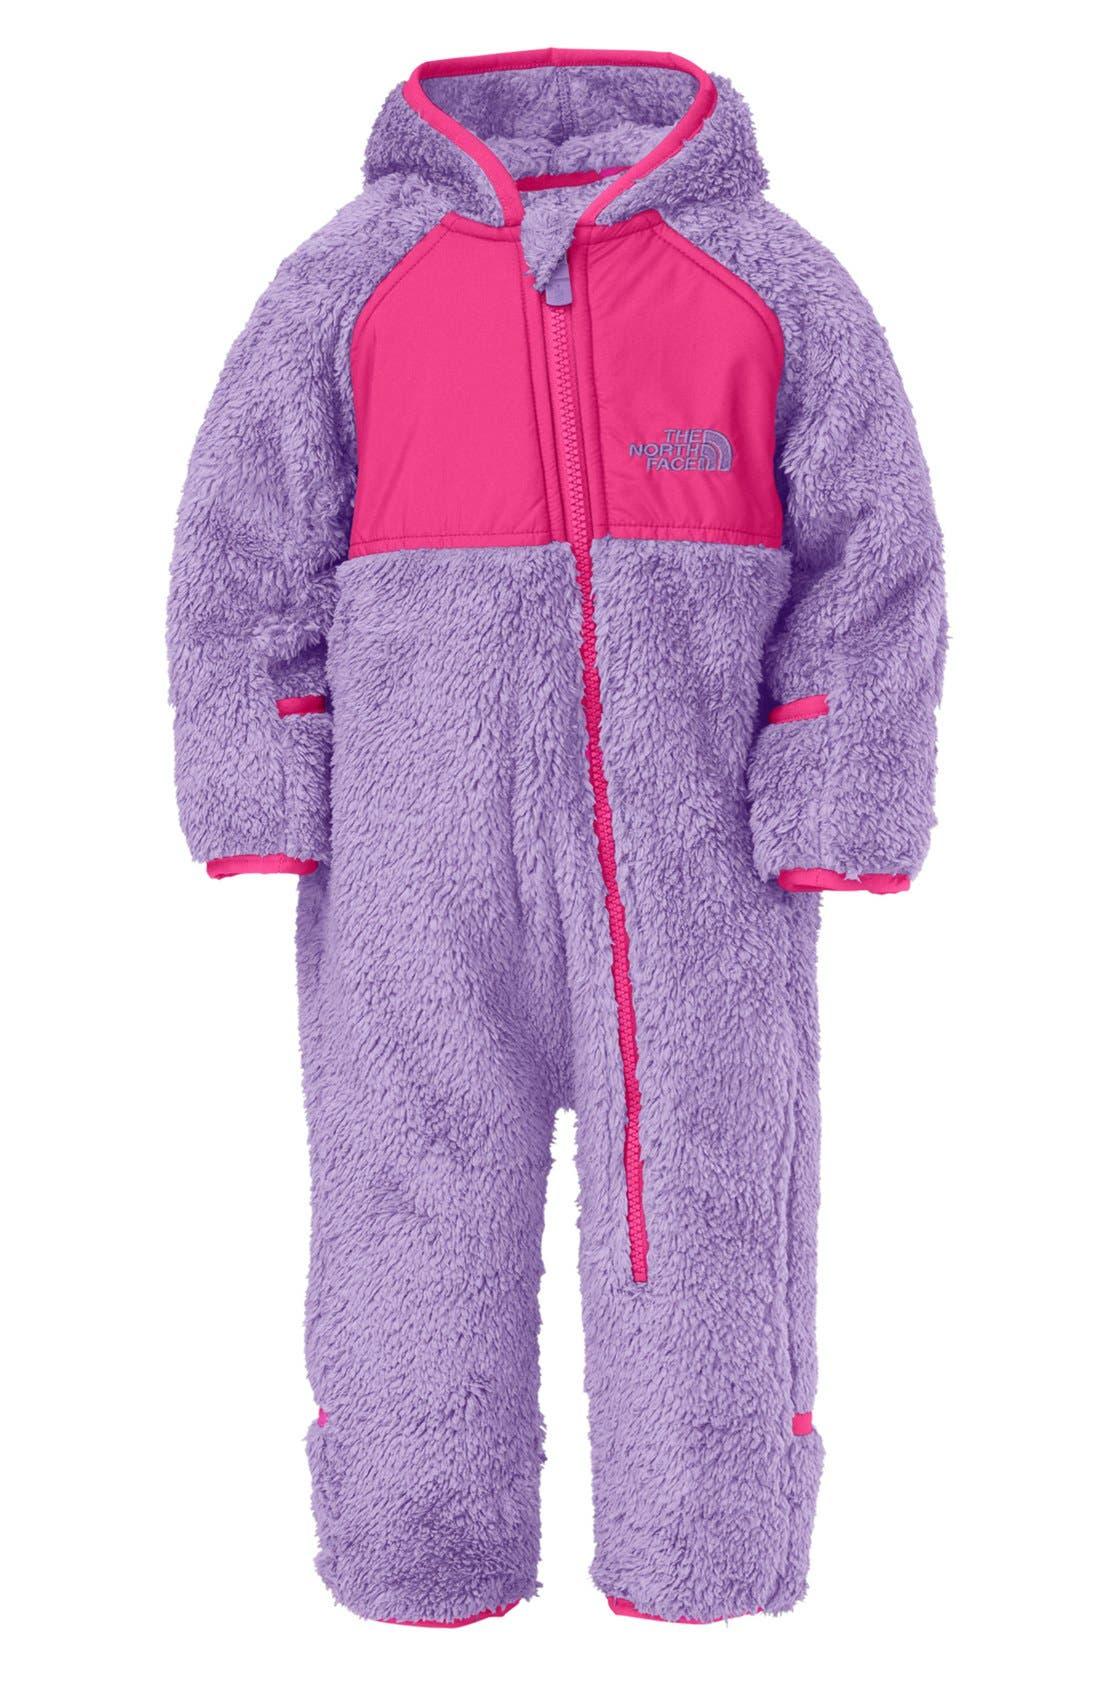 Main Image - The North Face 'Plushee' Fleece Bunting (Baby Girls)